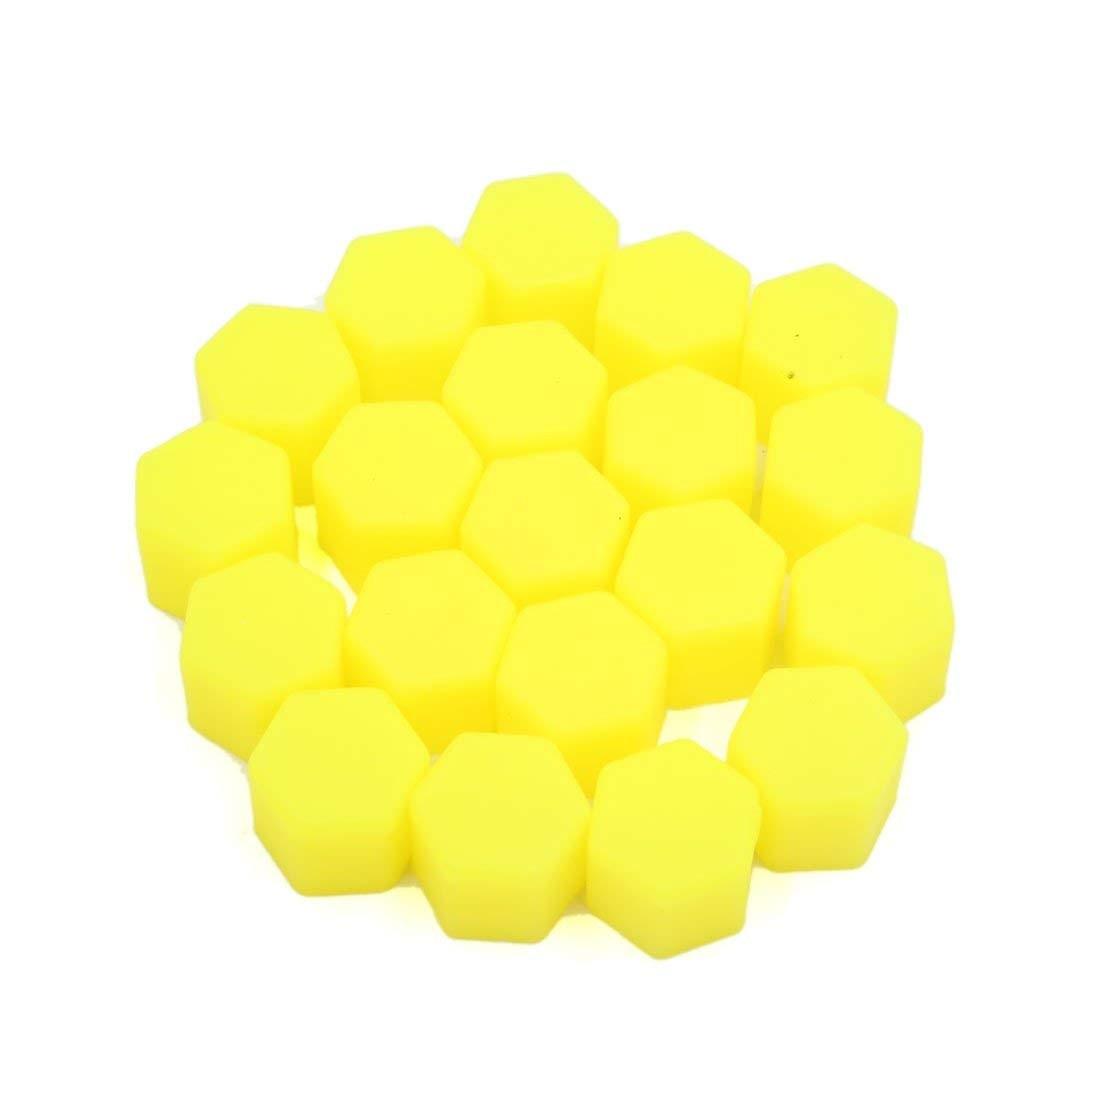 uxcell 20Pcs 19mm Yellow Luminous Car Wheel Lug Nut Bolt Hub Screw Cover Protective Cap